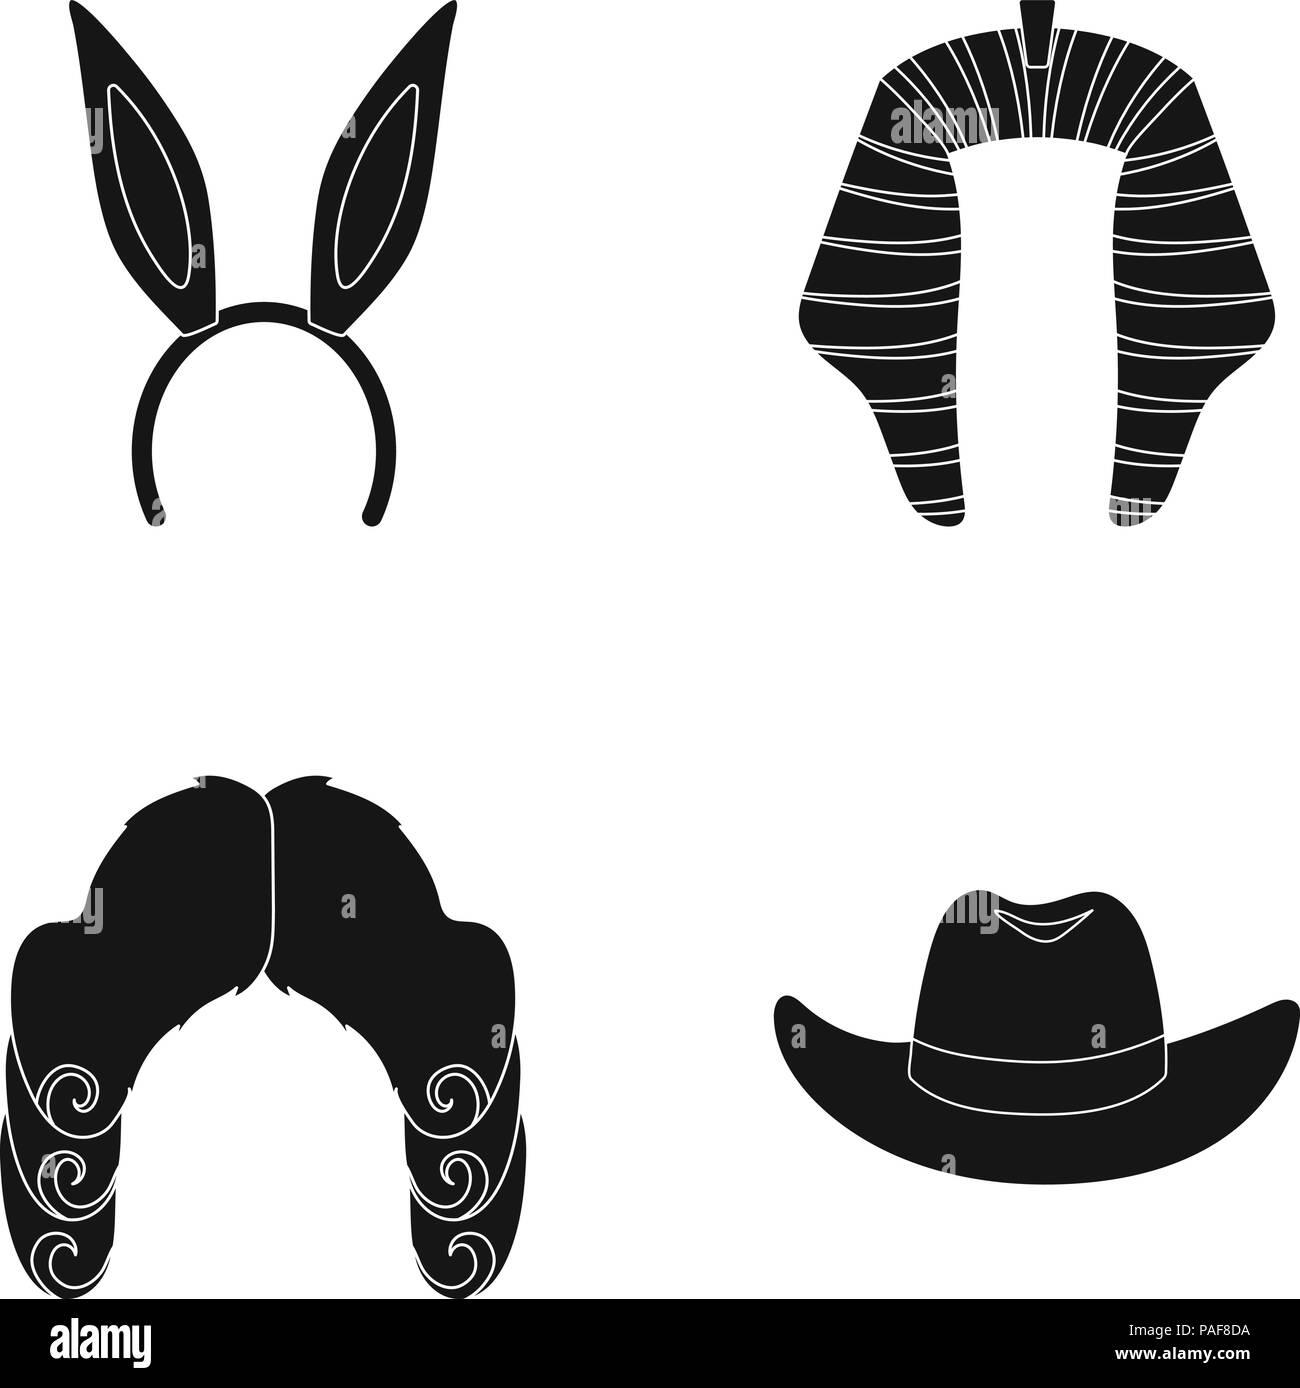 Professions Clip Art For Teacher - Color & Black & White Jobs Commercial  Use OK | Clip art, Black and white, Black n white images